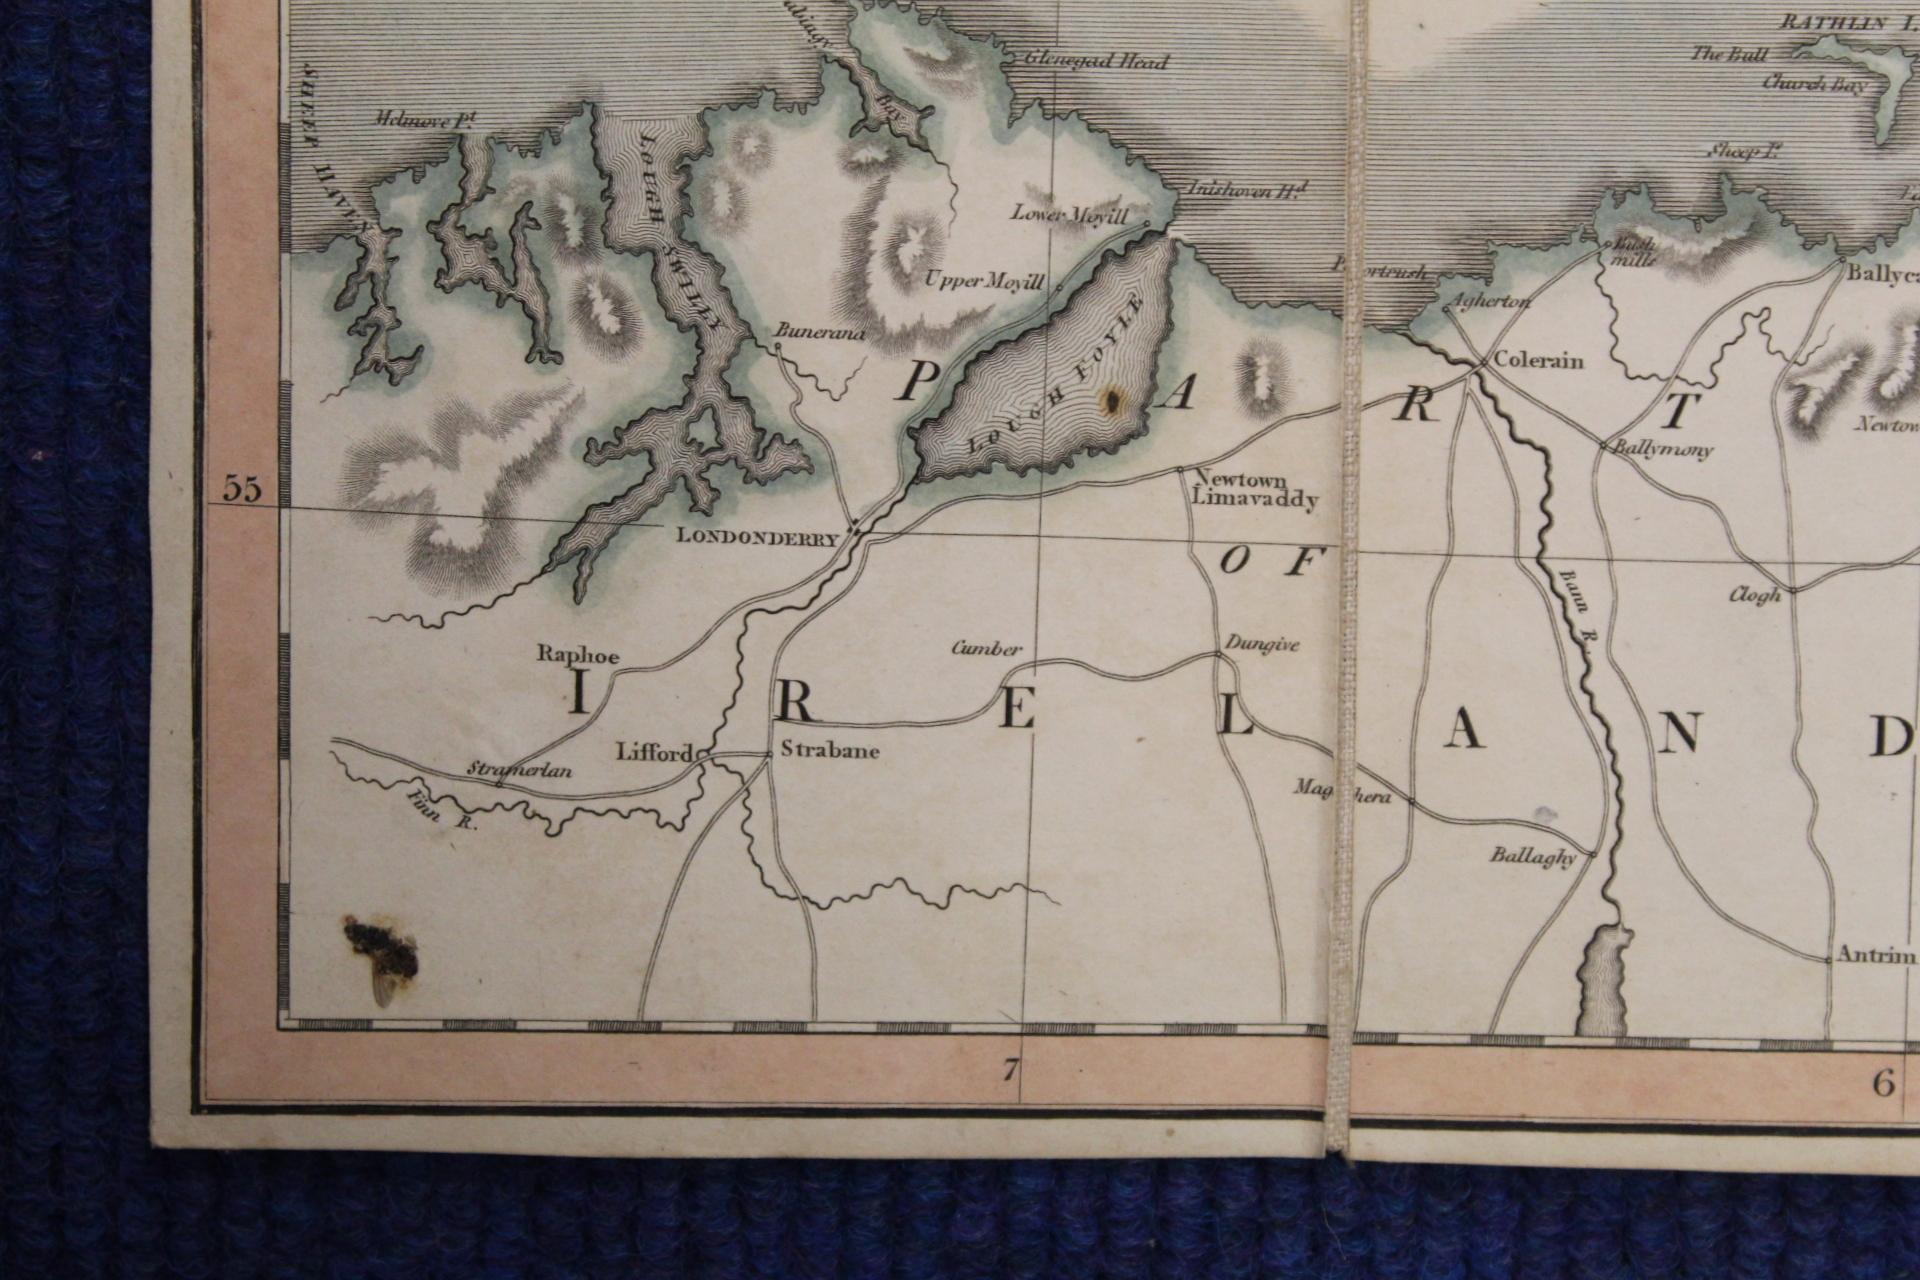 KIRKWOOD J. & SONS.Map of Scotland. Hand col. eng. fldg. linen map in well worn orig. slip case. - Image 35 of 36